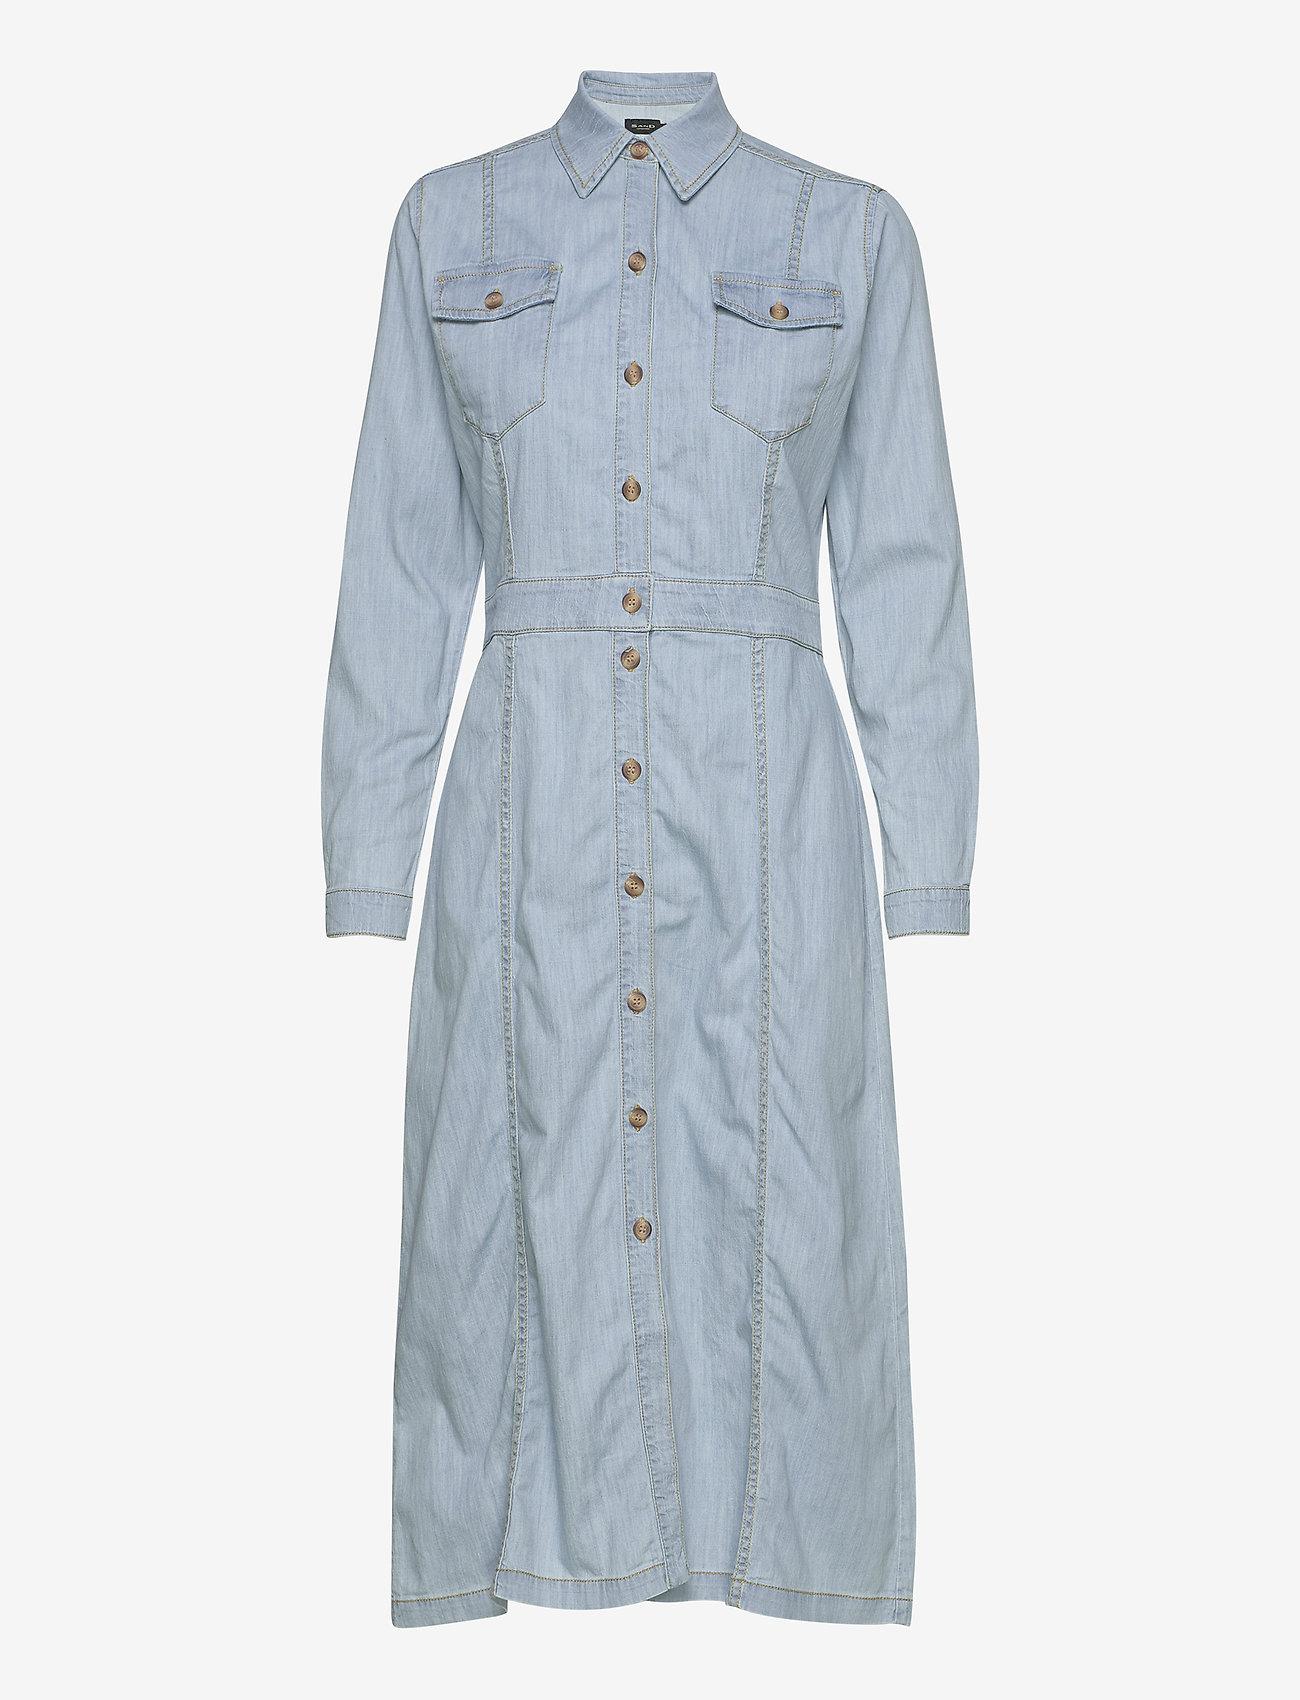 SAND - R/Denim - Mati - robes en jeans - light blue - 0